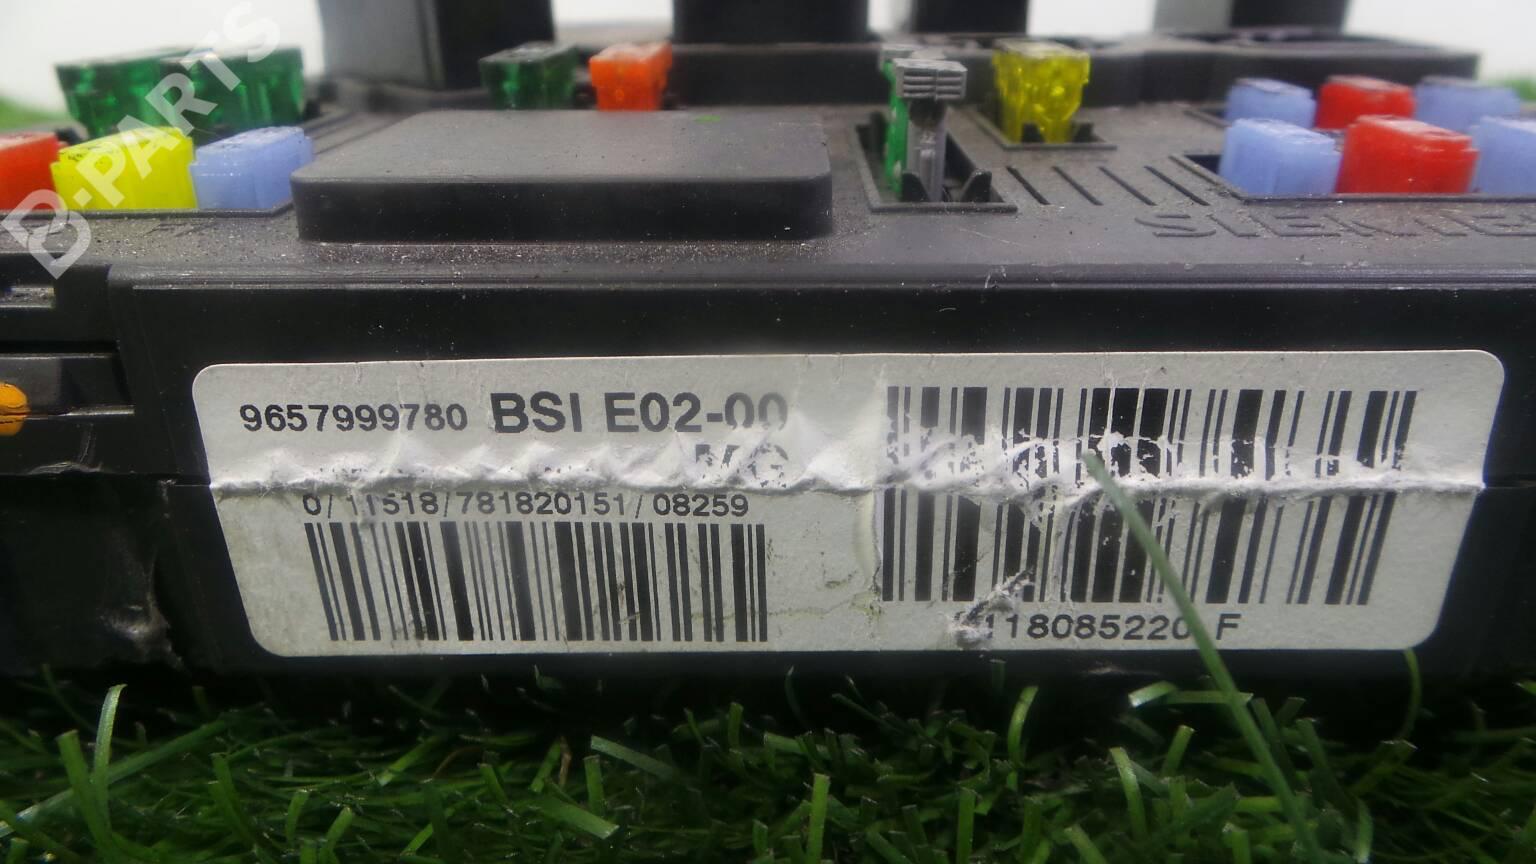 Fuse Box Peugeot 206 Sw 2e K 14 Hdi 1181823 Manual 9657999780 Hdi5